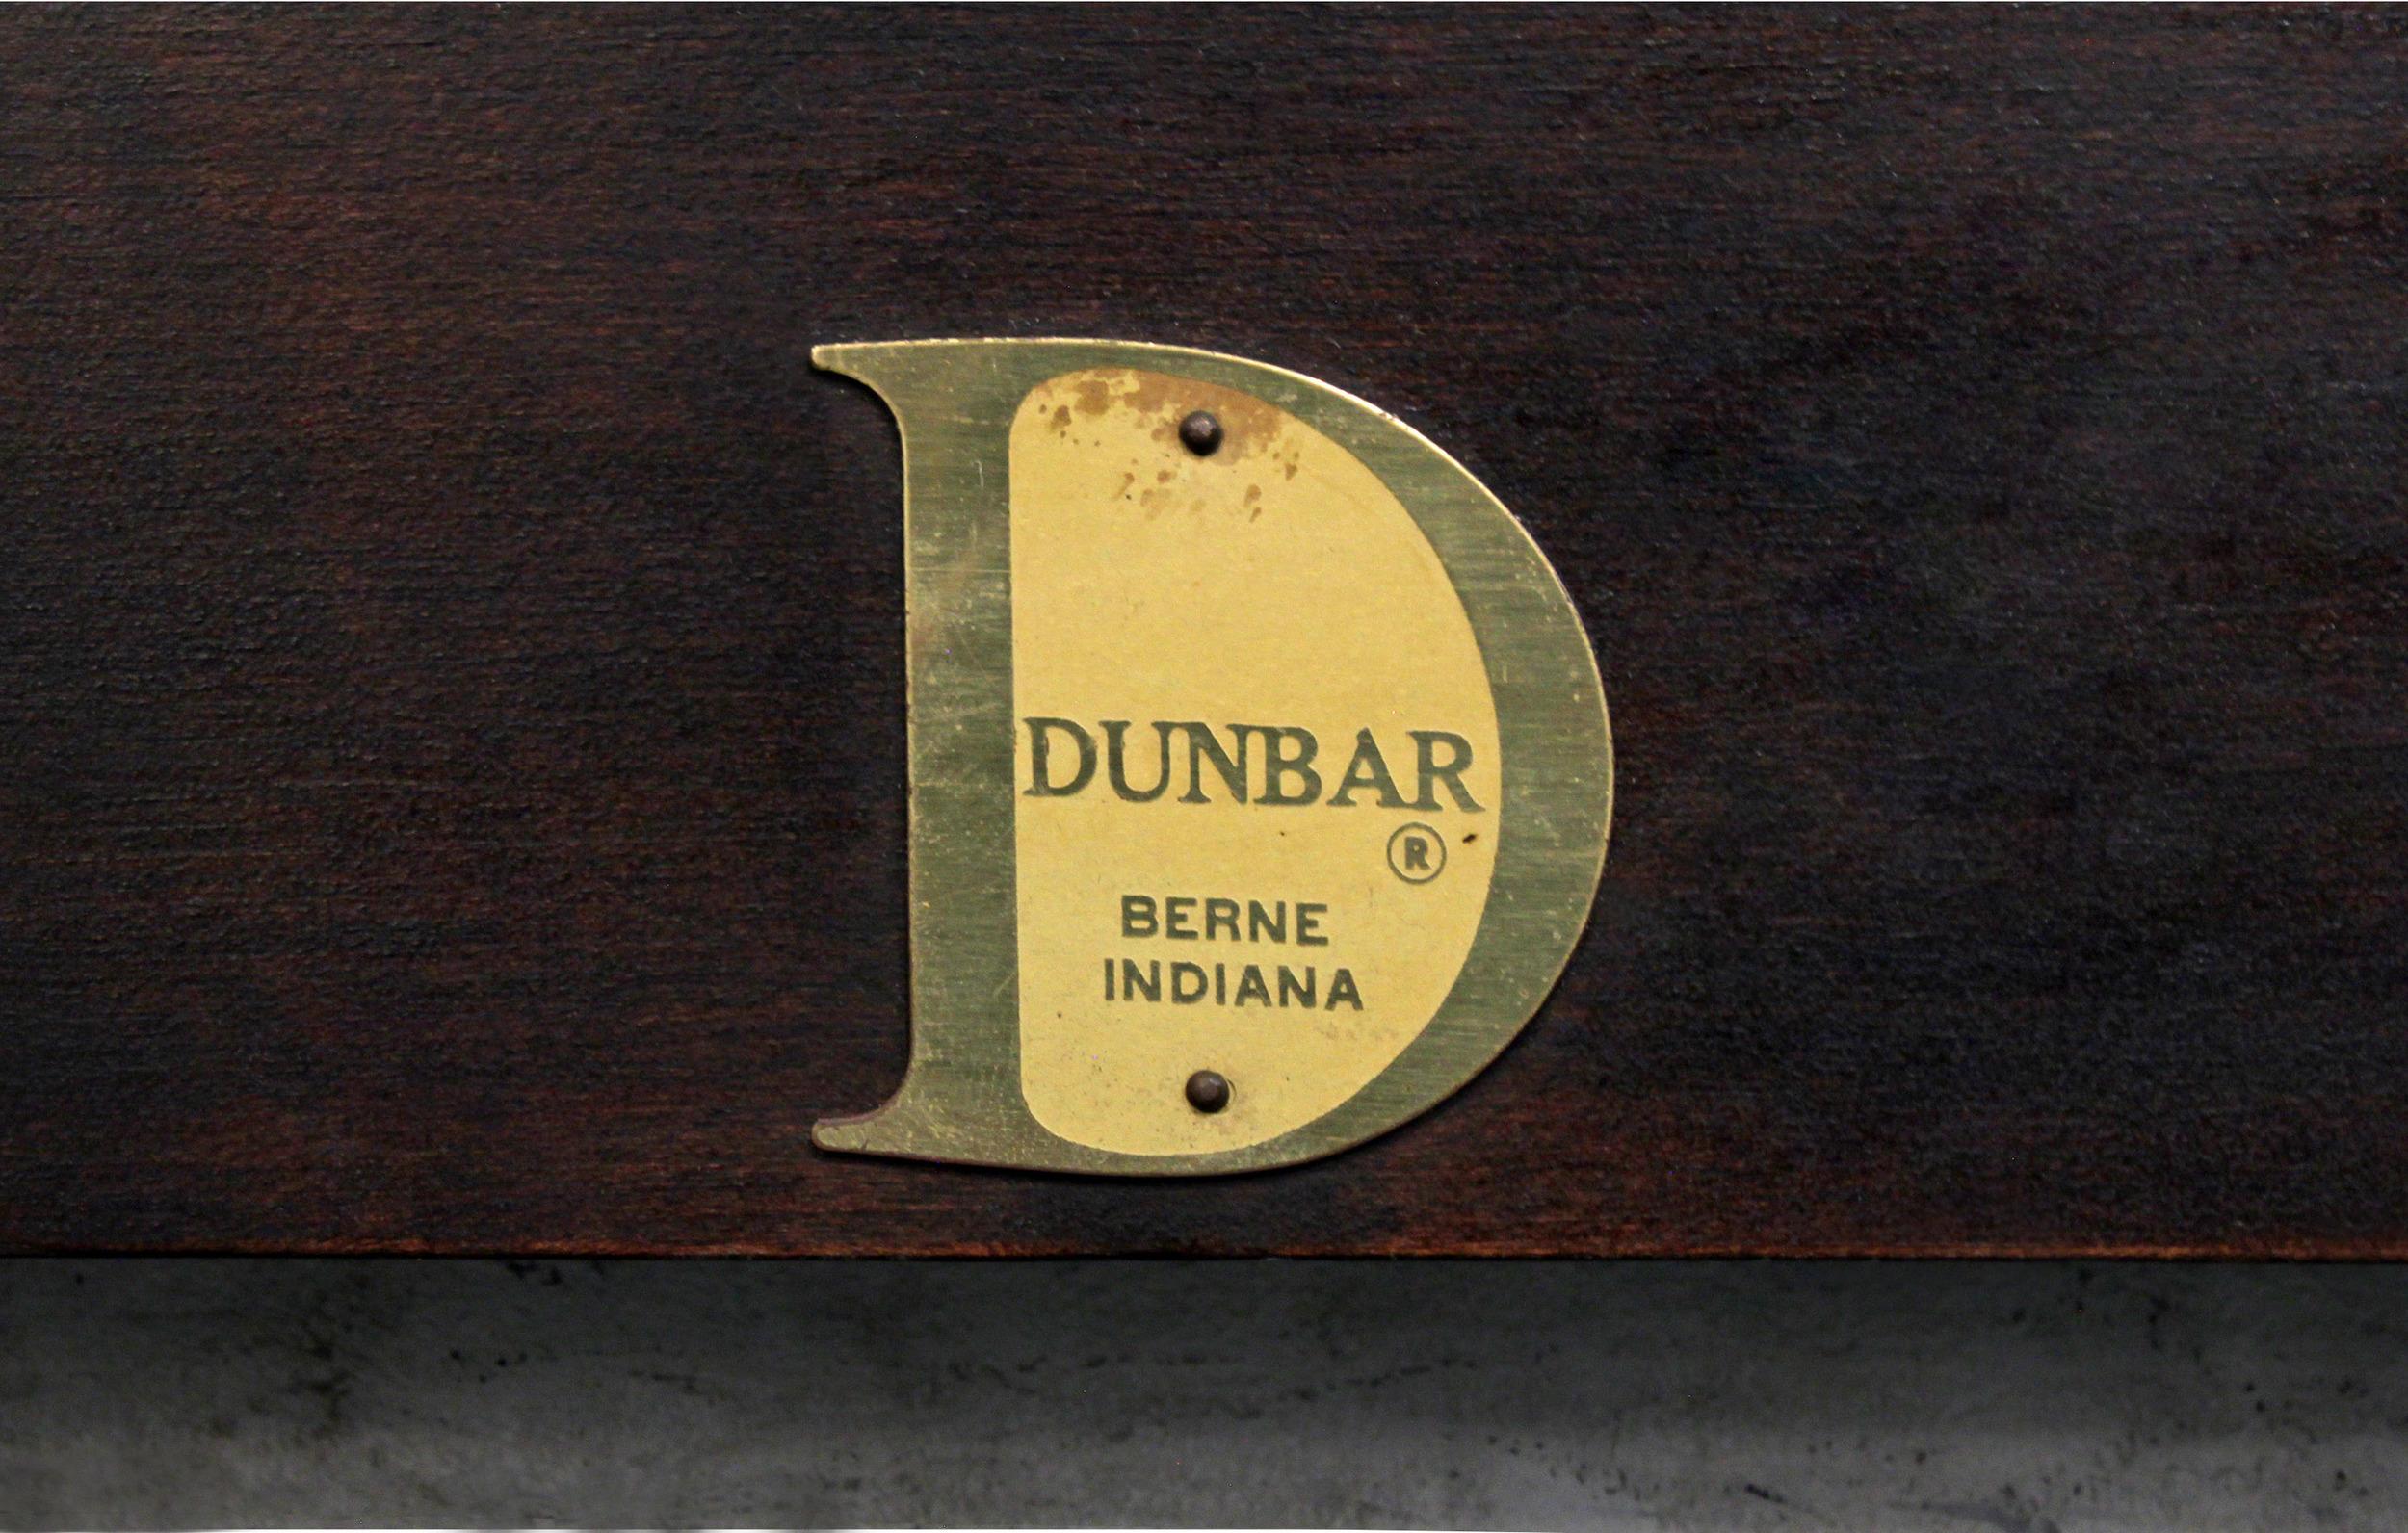 Dunbar 30 mahog+tawi inset full headboard8 detail1 hires.jpg